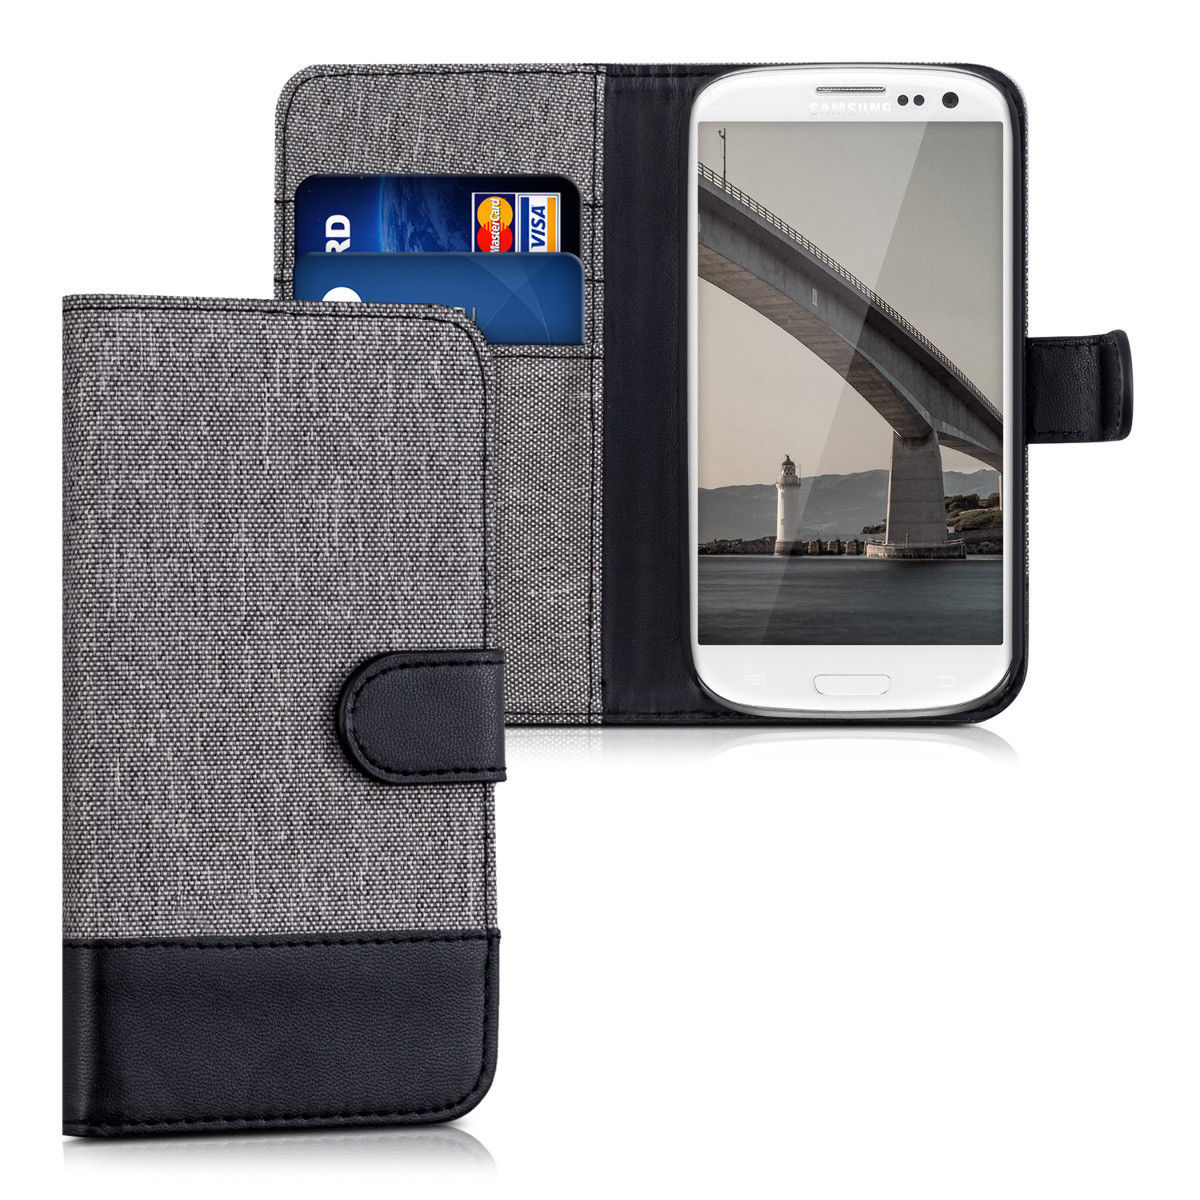 Pouzdro pro Samsung Galaxy S3 Neo šedé